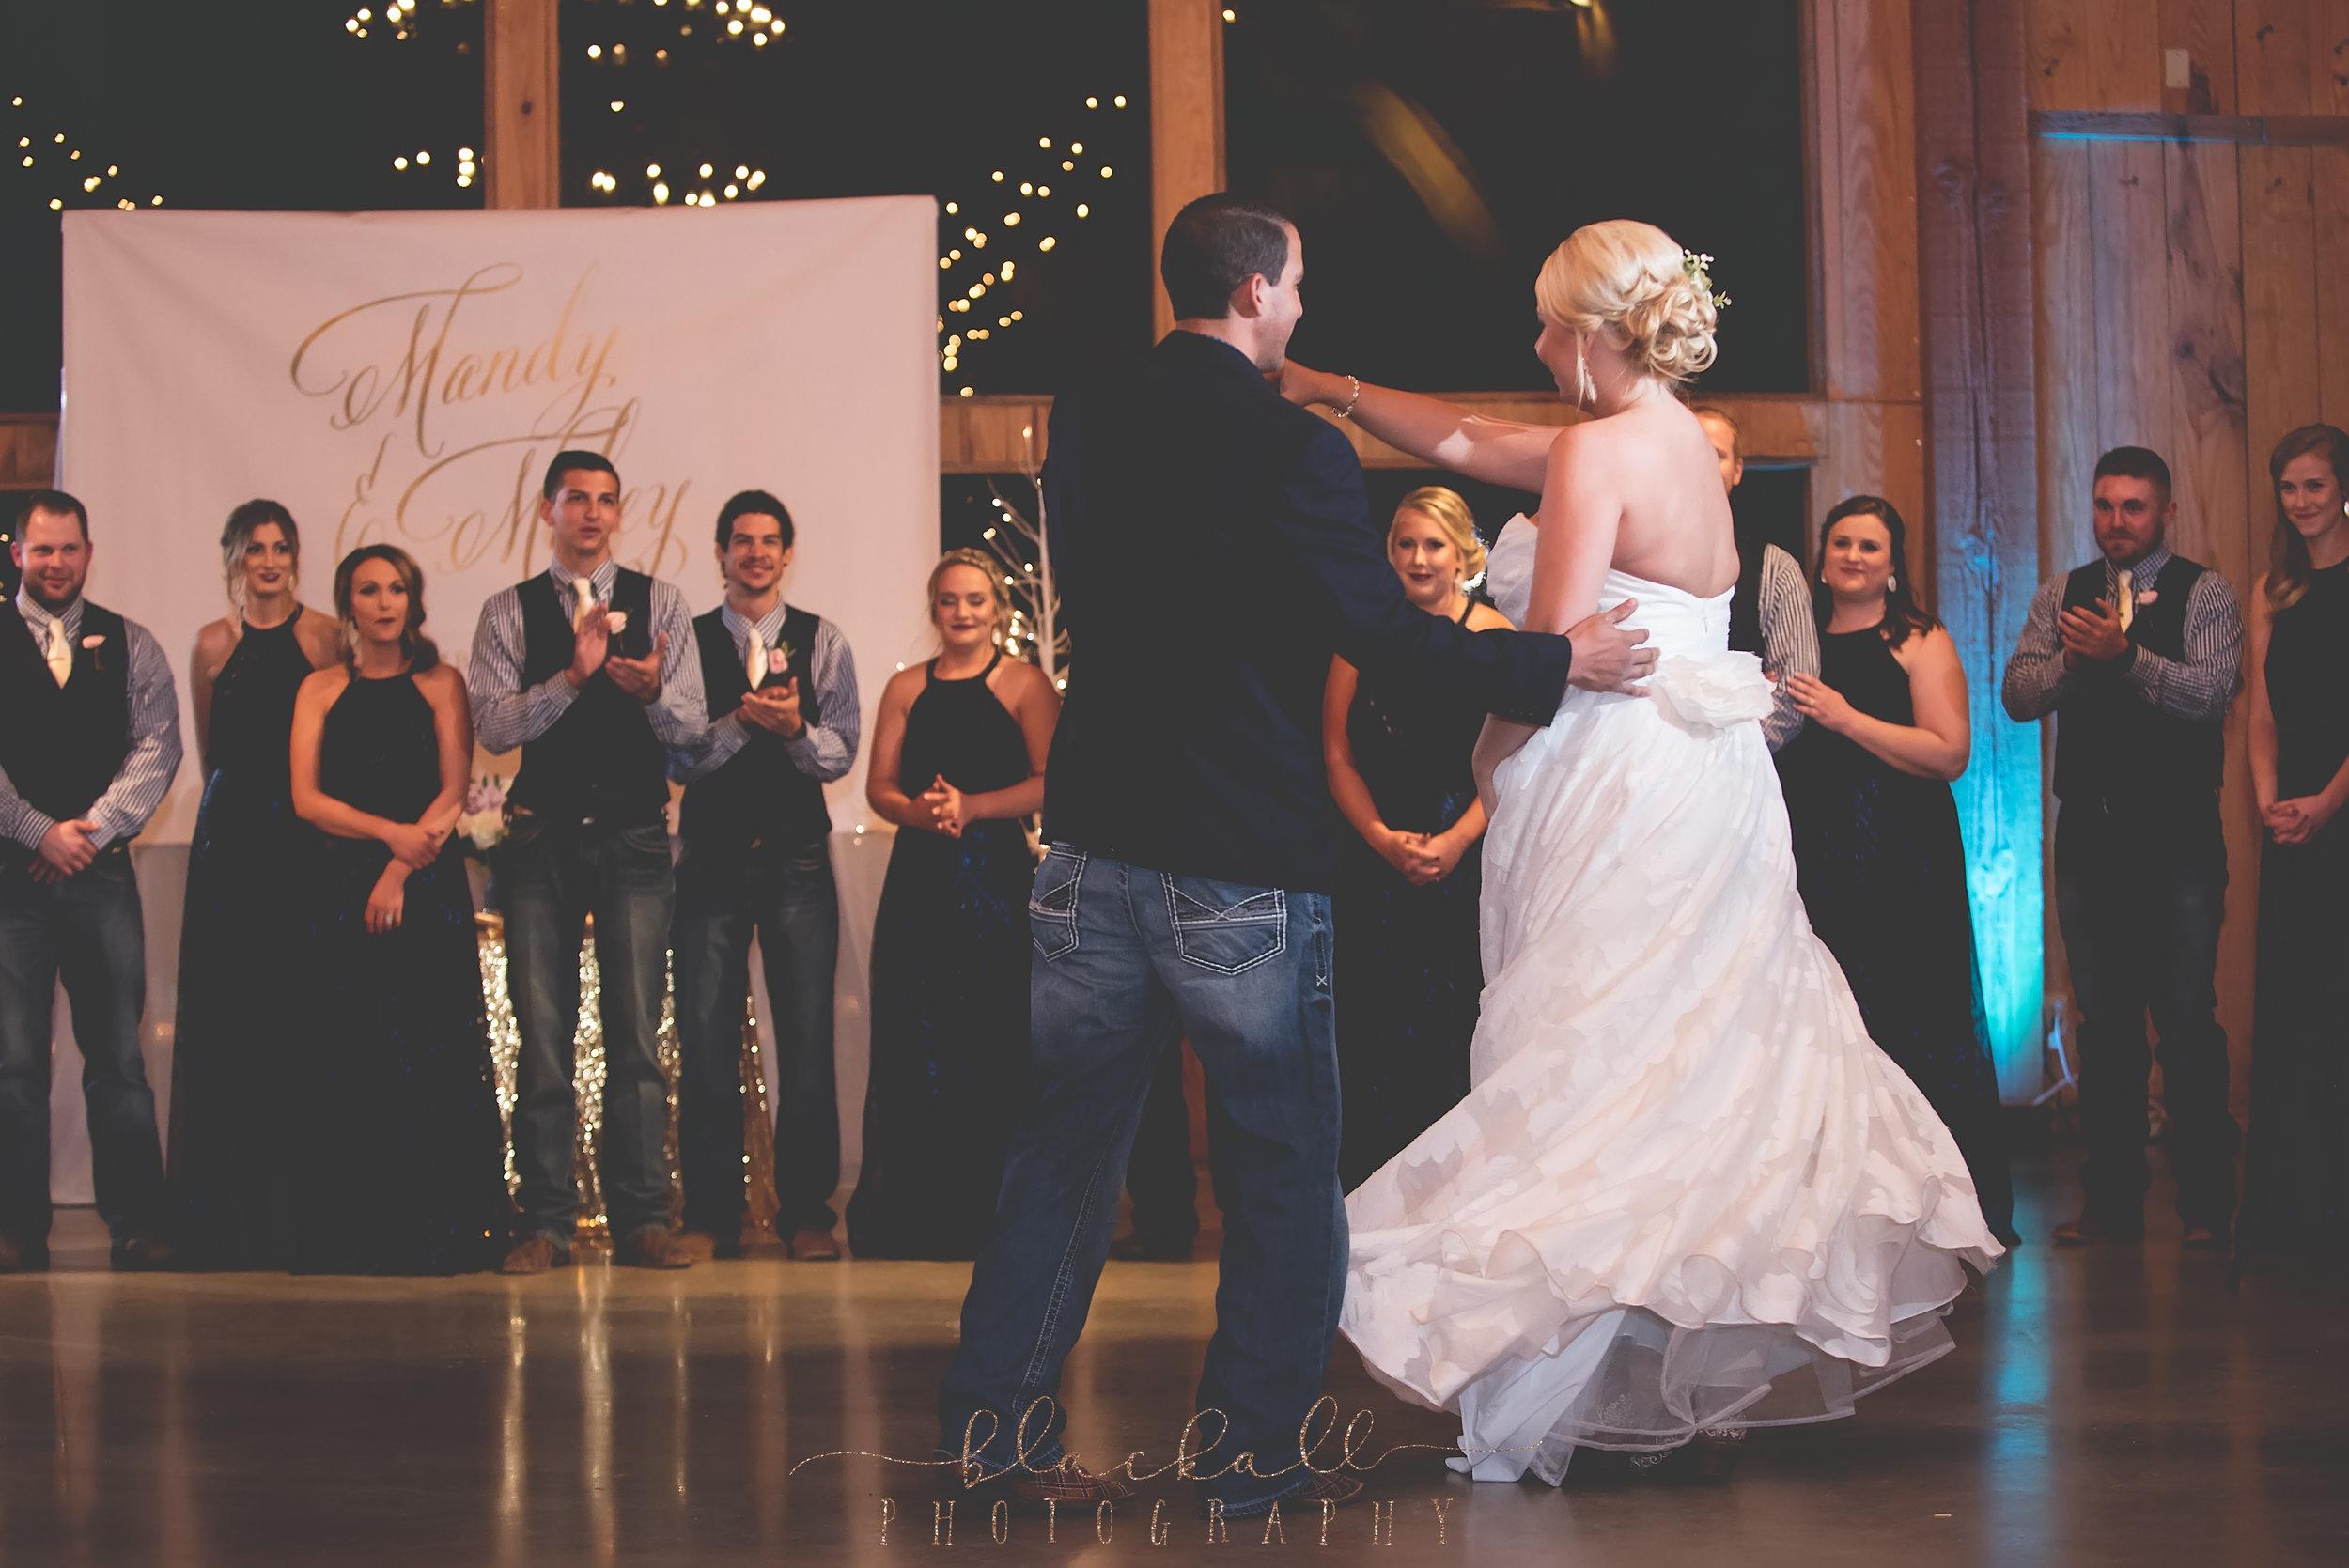 M&M WEDDING_Blackall Photography-53.JPG